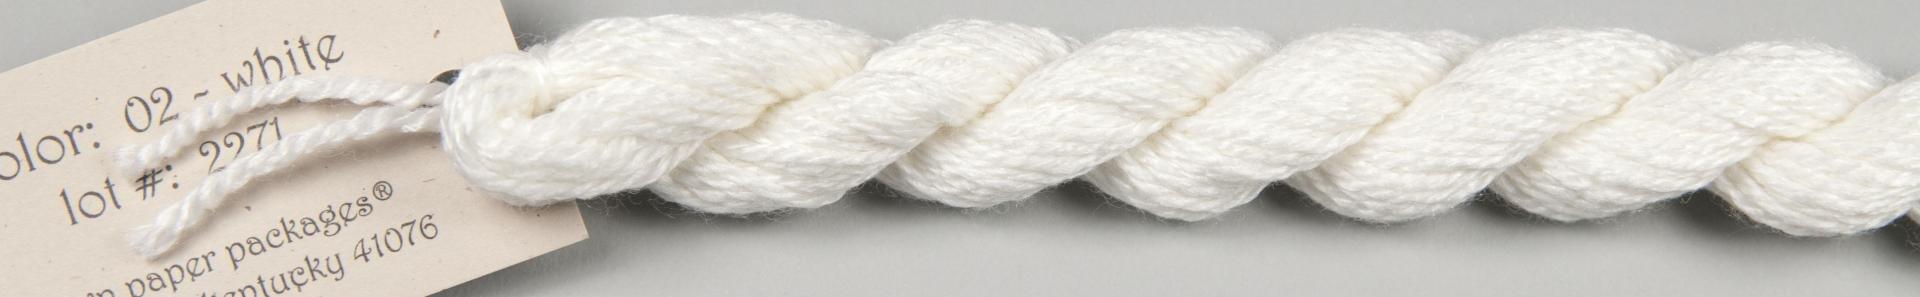 Silk & Ivory 02 WHITE